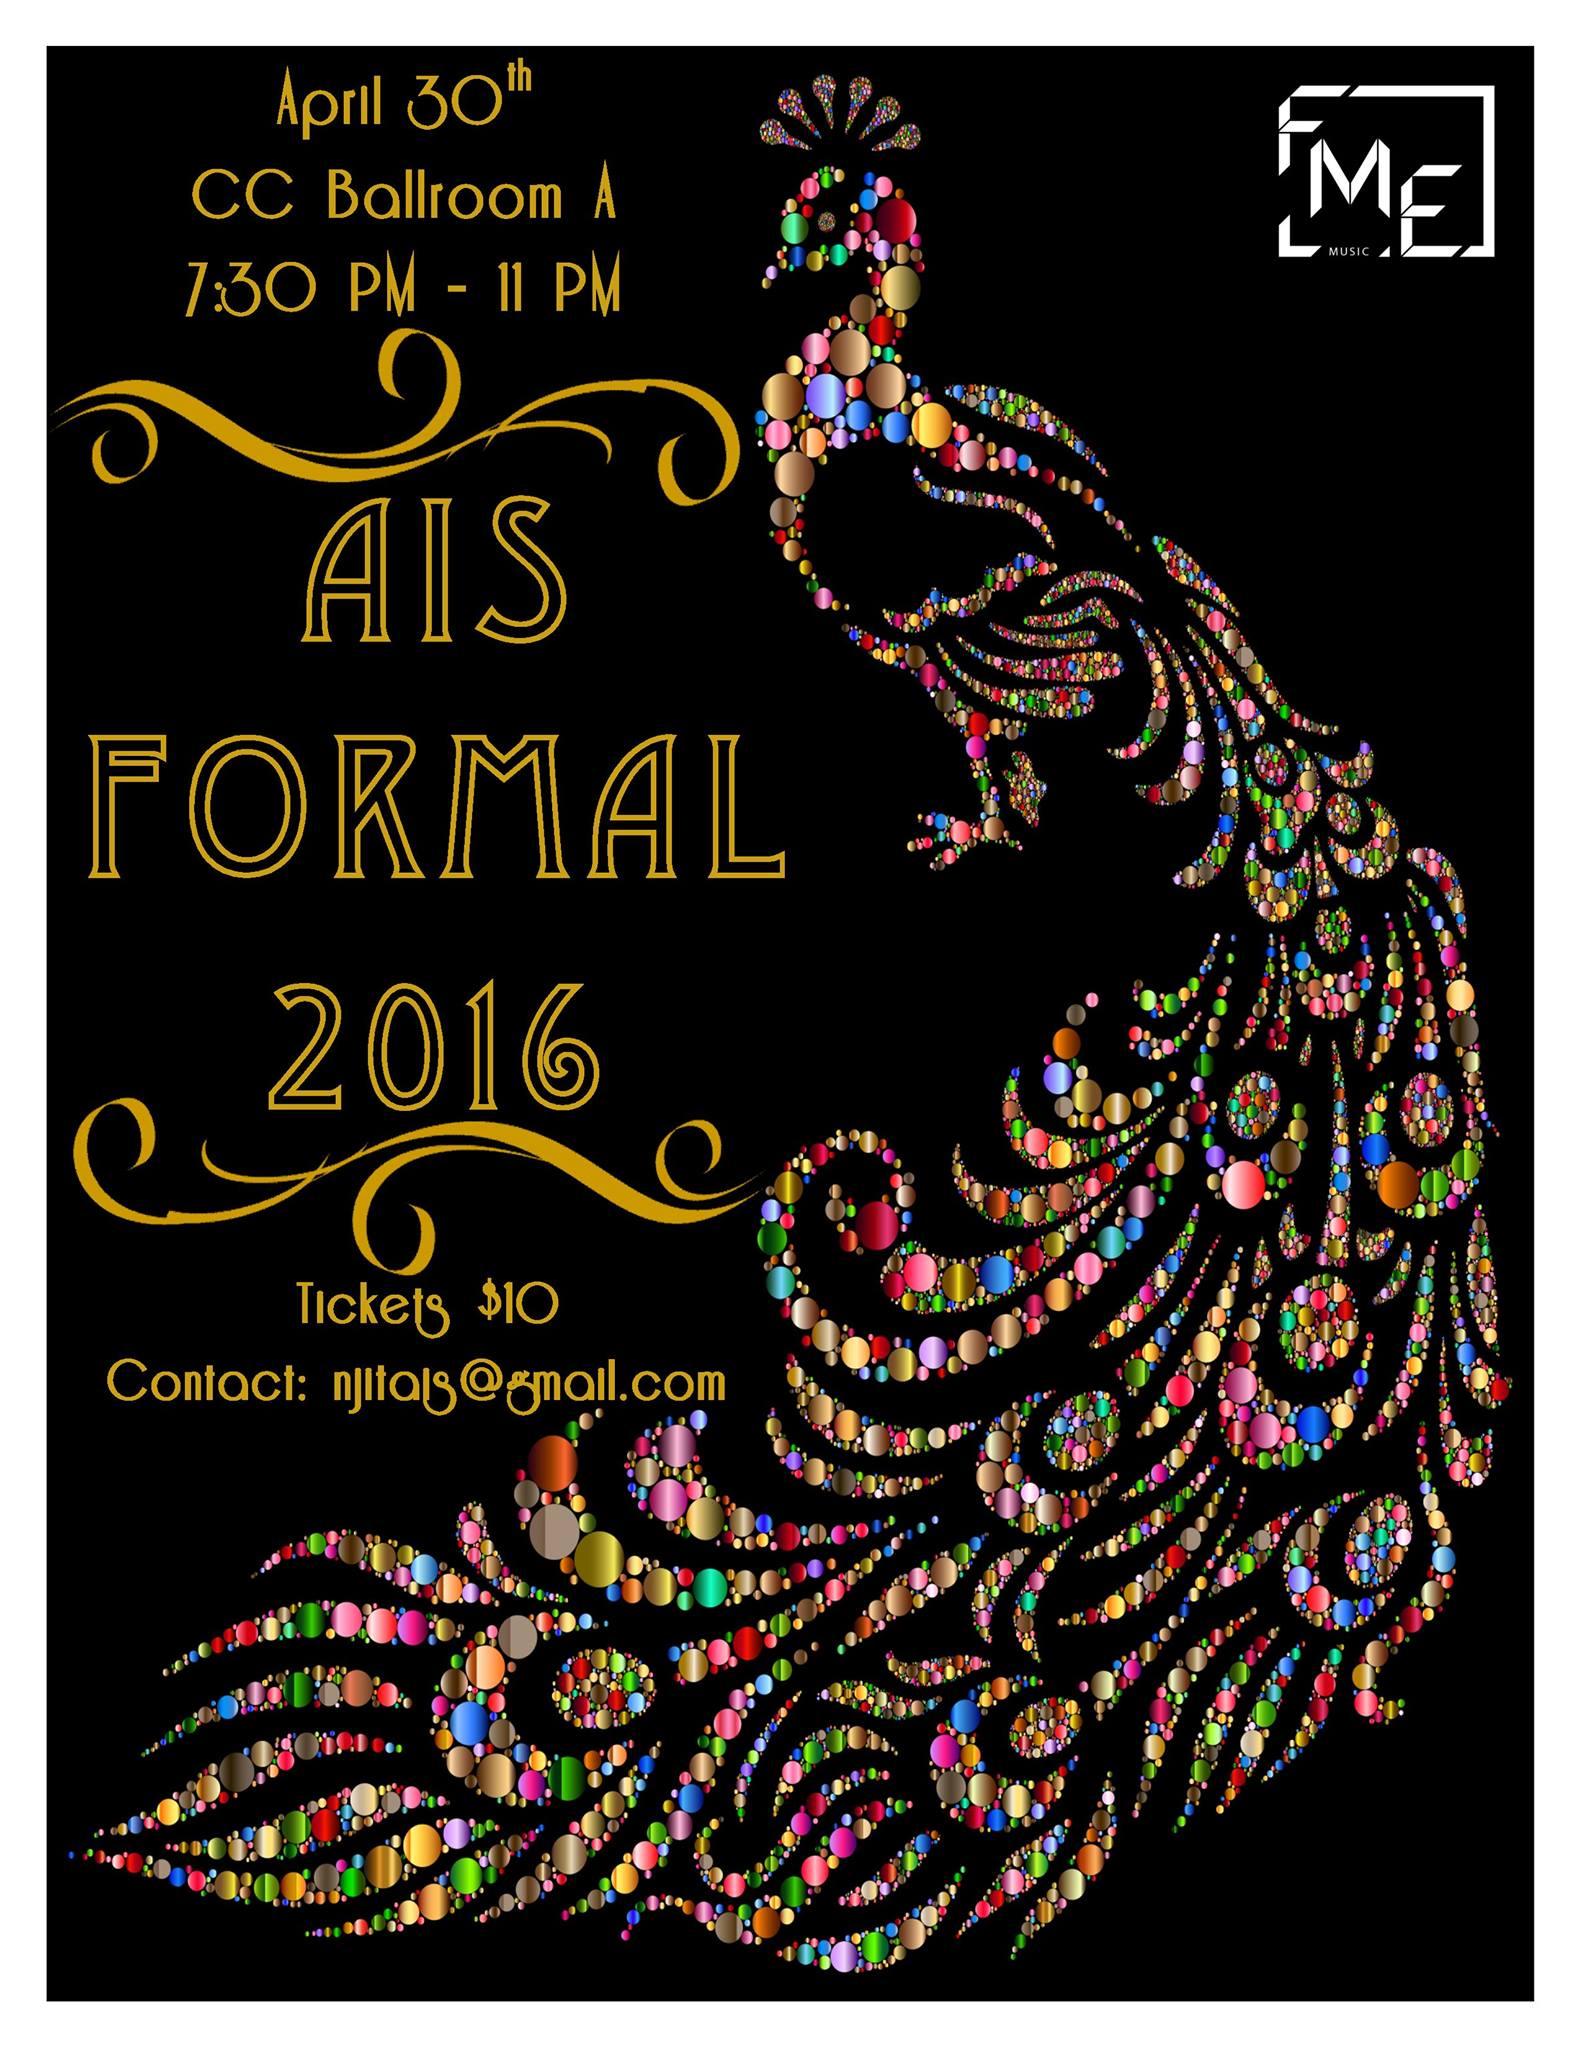 AIS Formal 2016